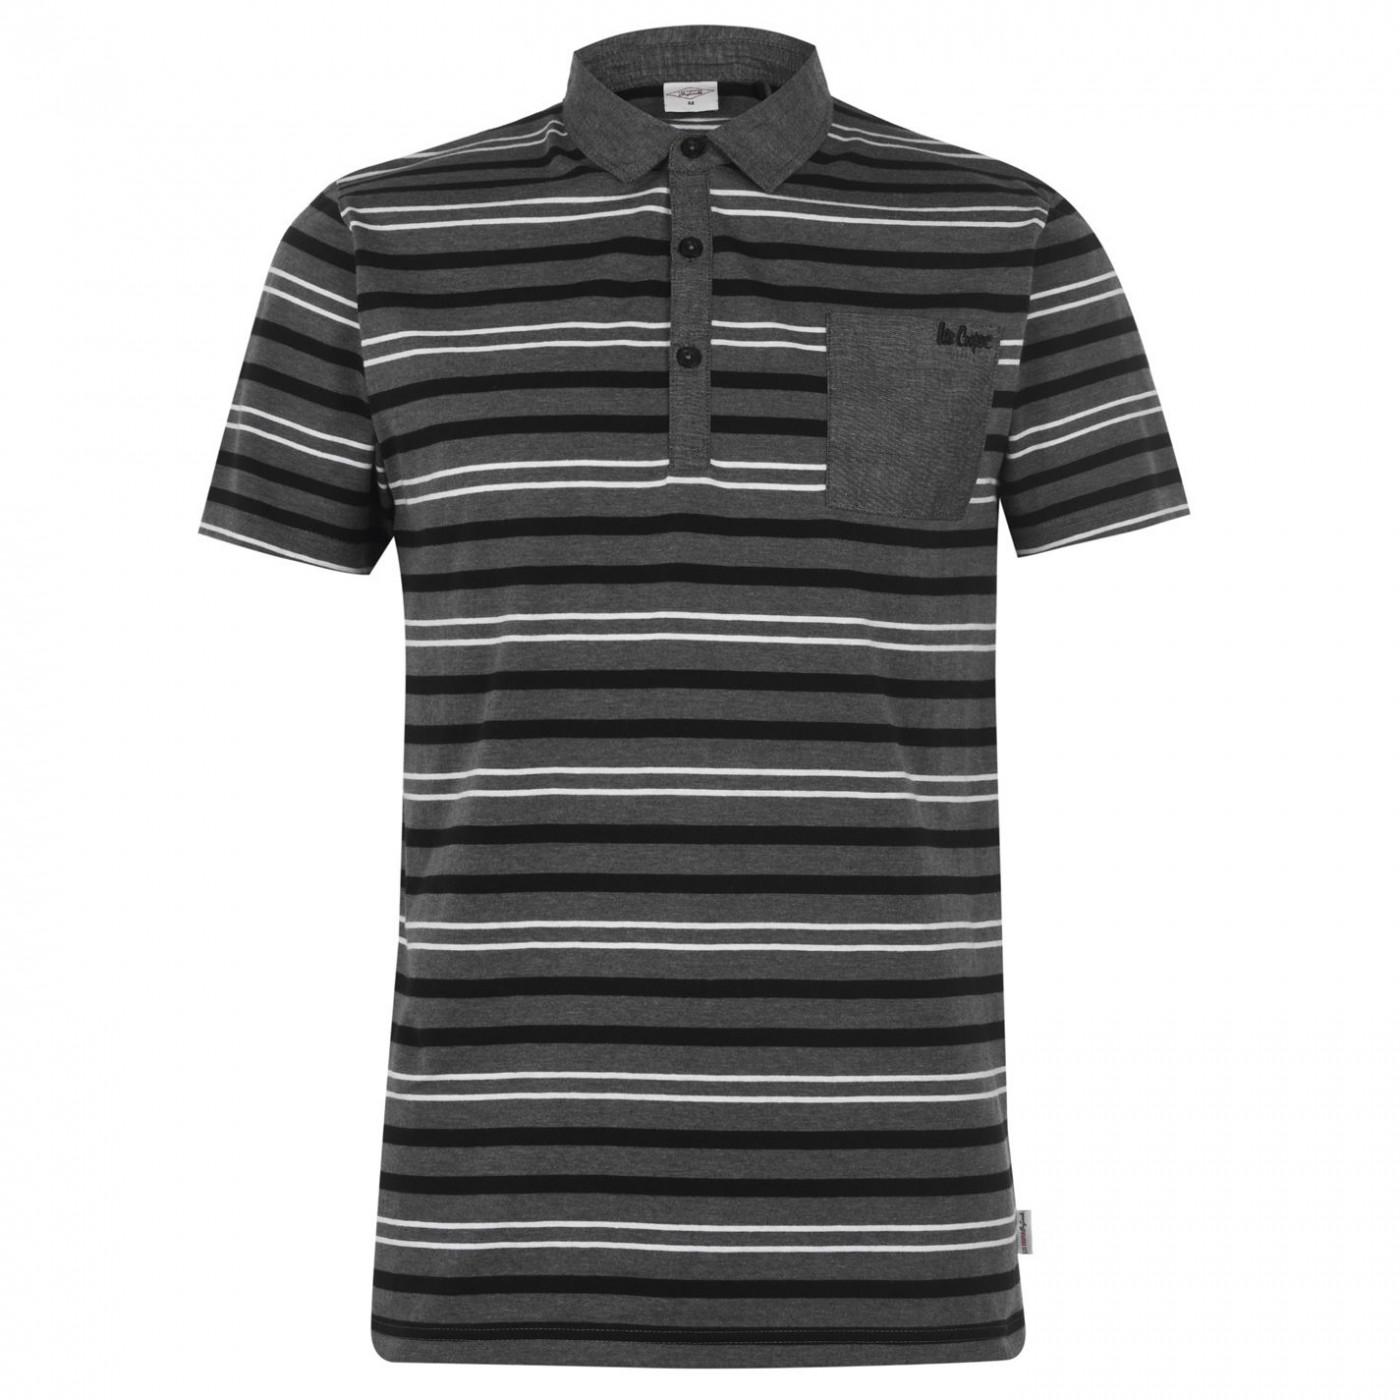 Men's Polo T-shirt Lee Cooper Double Stripe